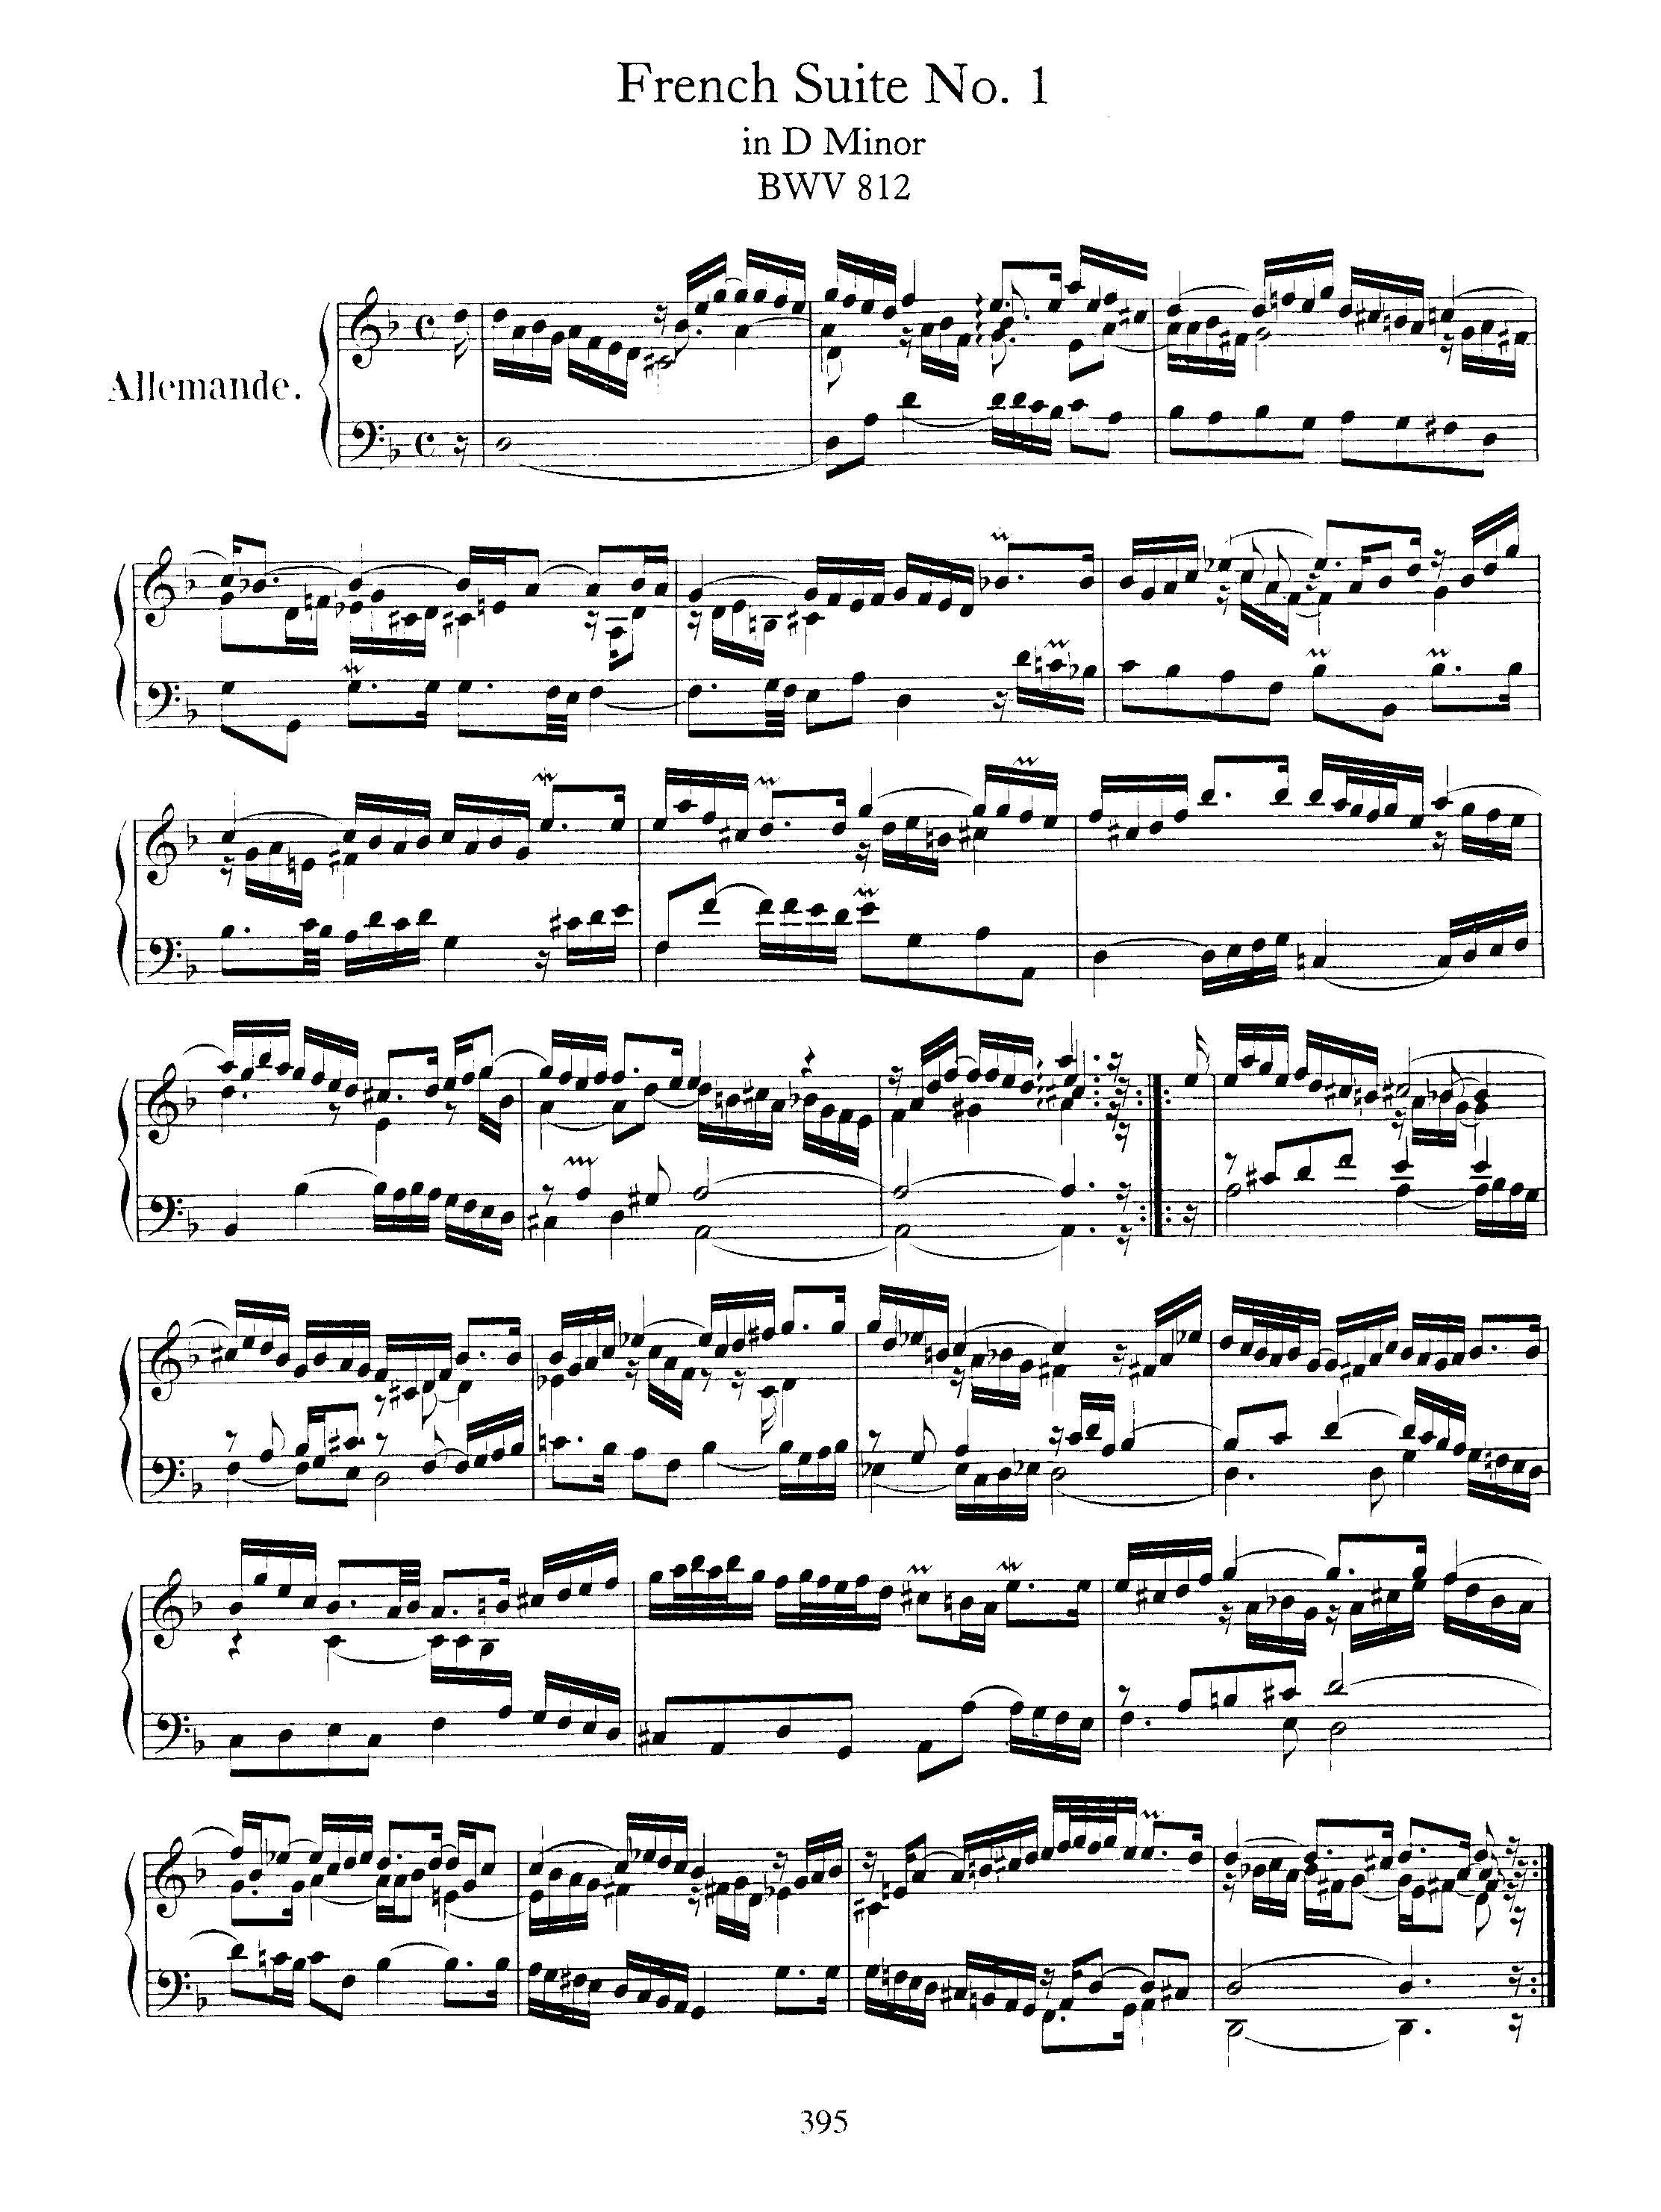 Bach keyboard sheet music for piano